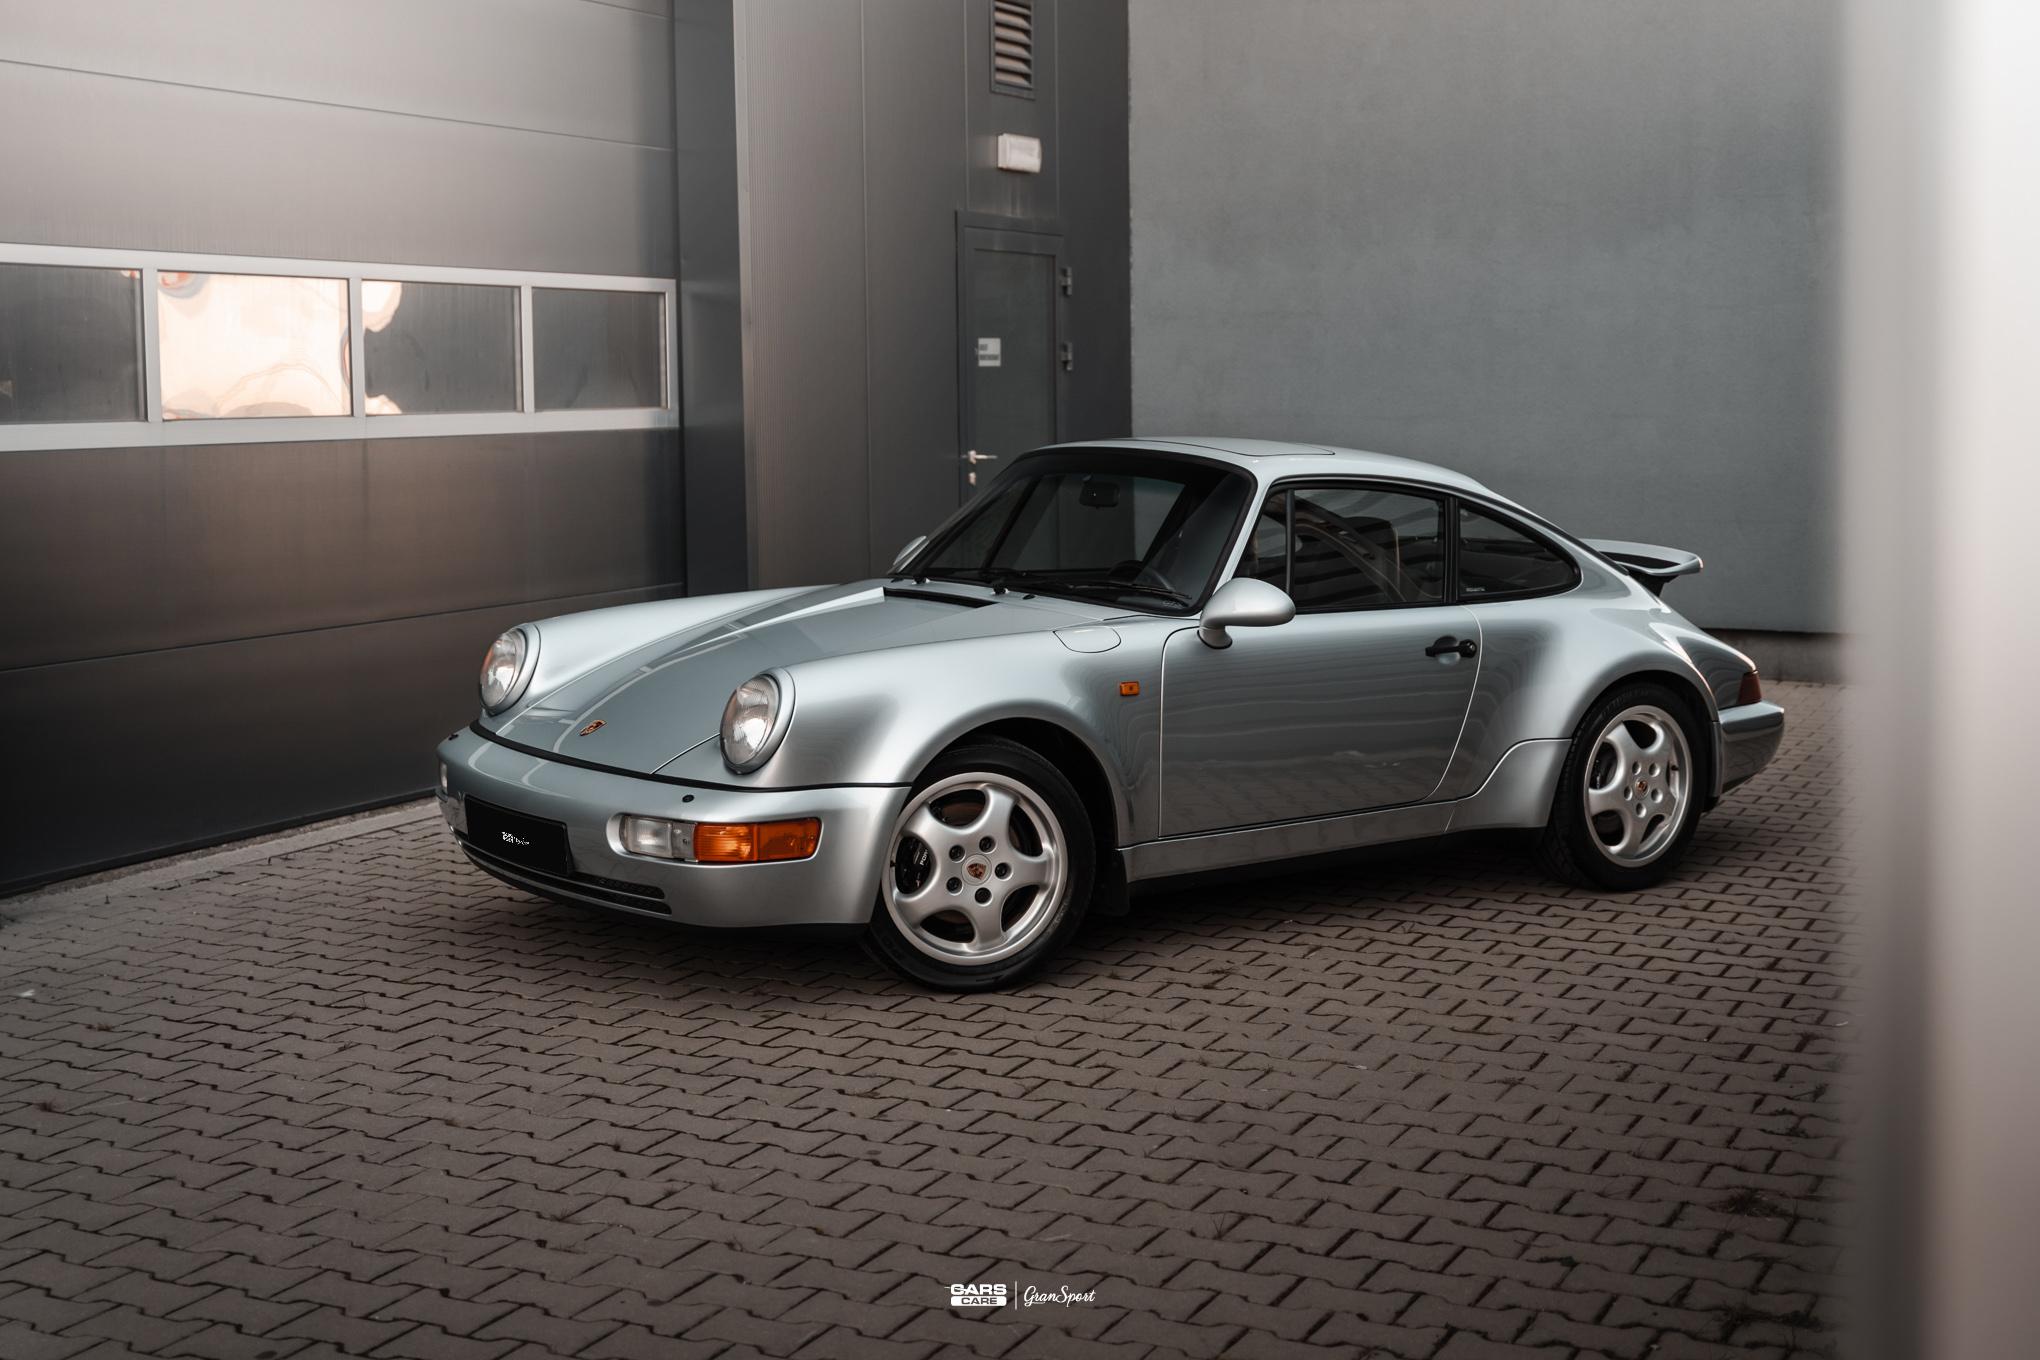 Porsche 911 964 - Powłoka ceramiczna - carscare.pl